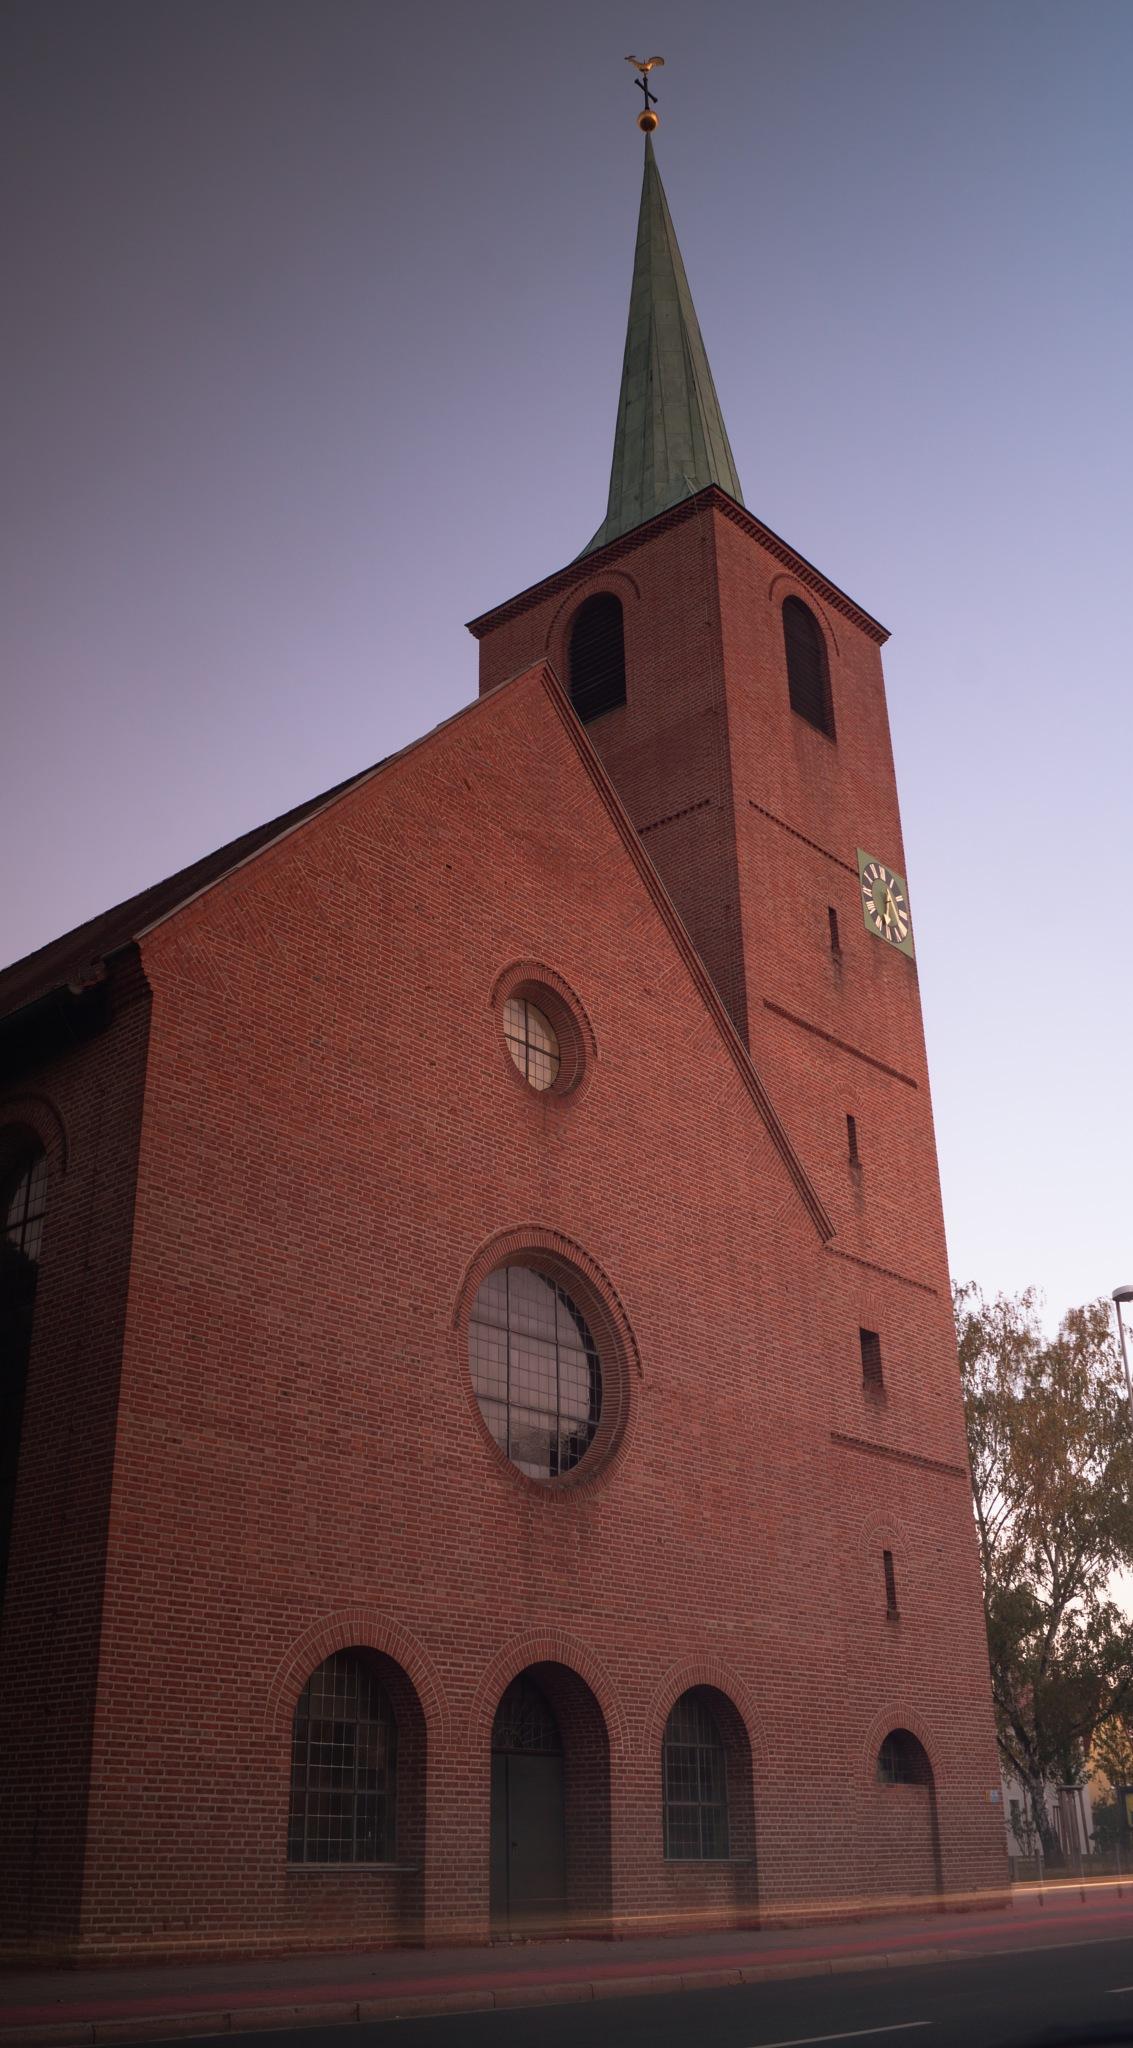 Church before the sundown by Marcelo Hernan Zimmt